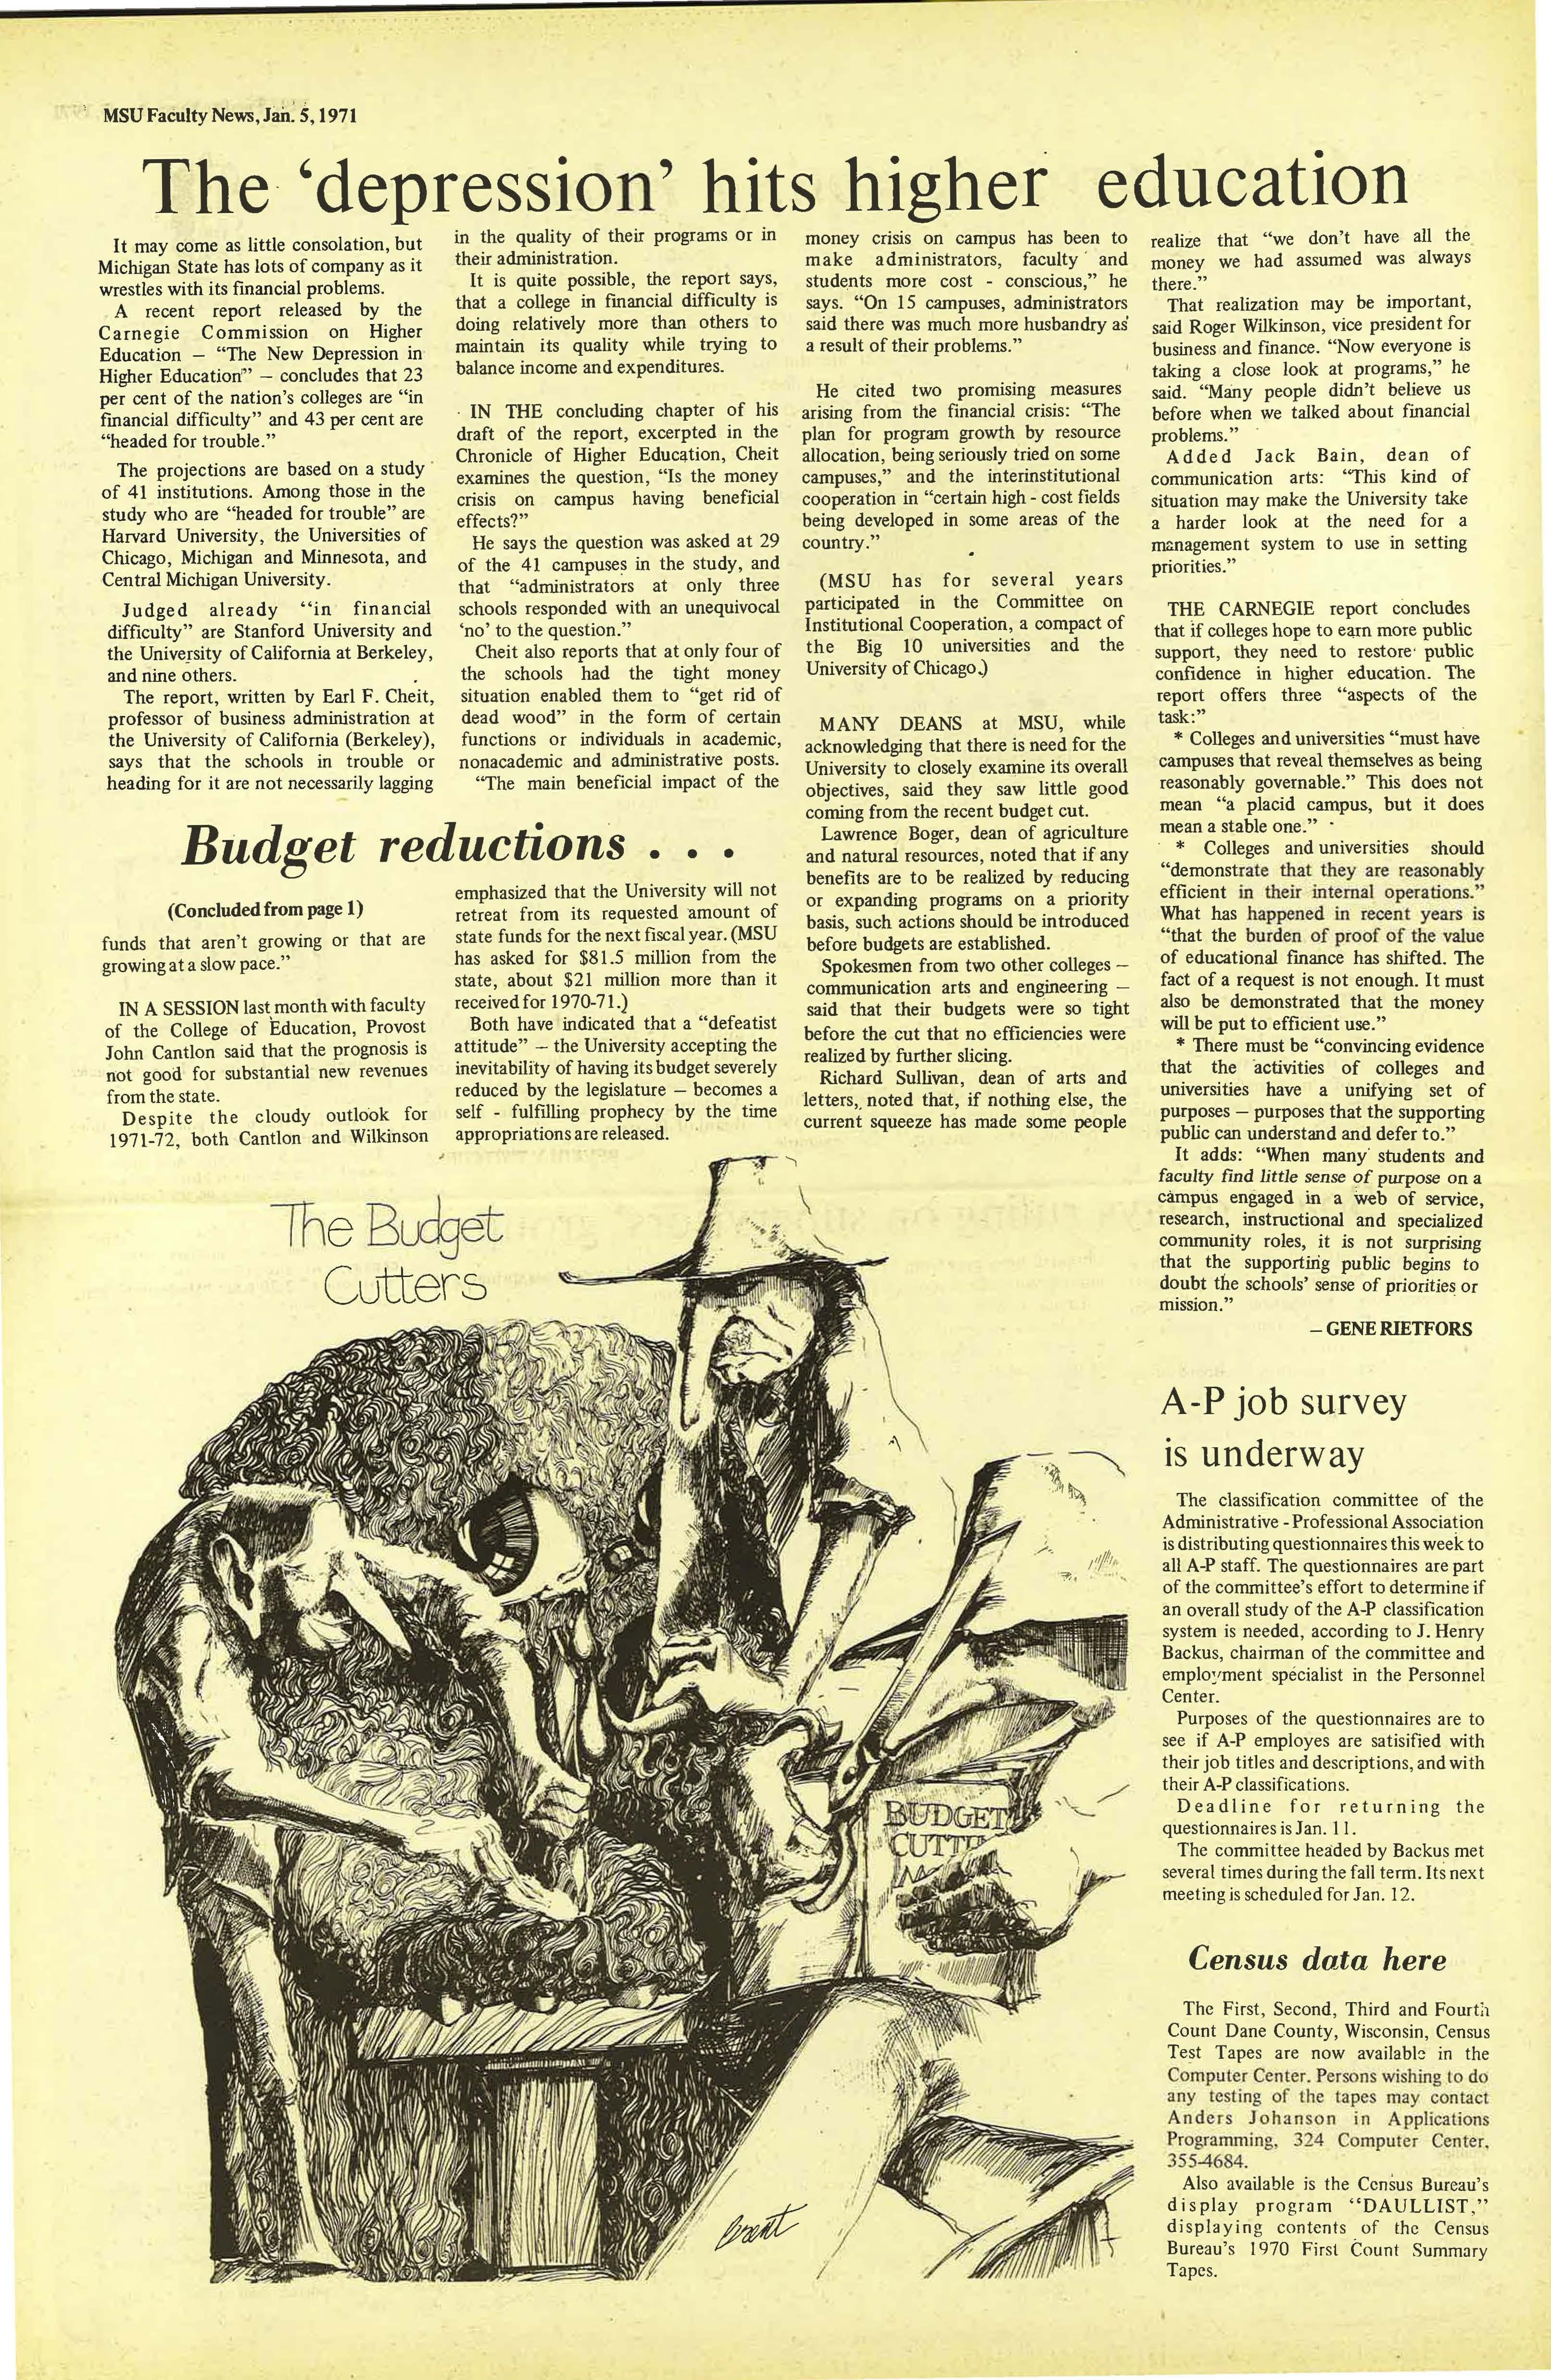 MSU News Bulletin, vol. 3, No. 8, November 11, 1971